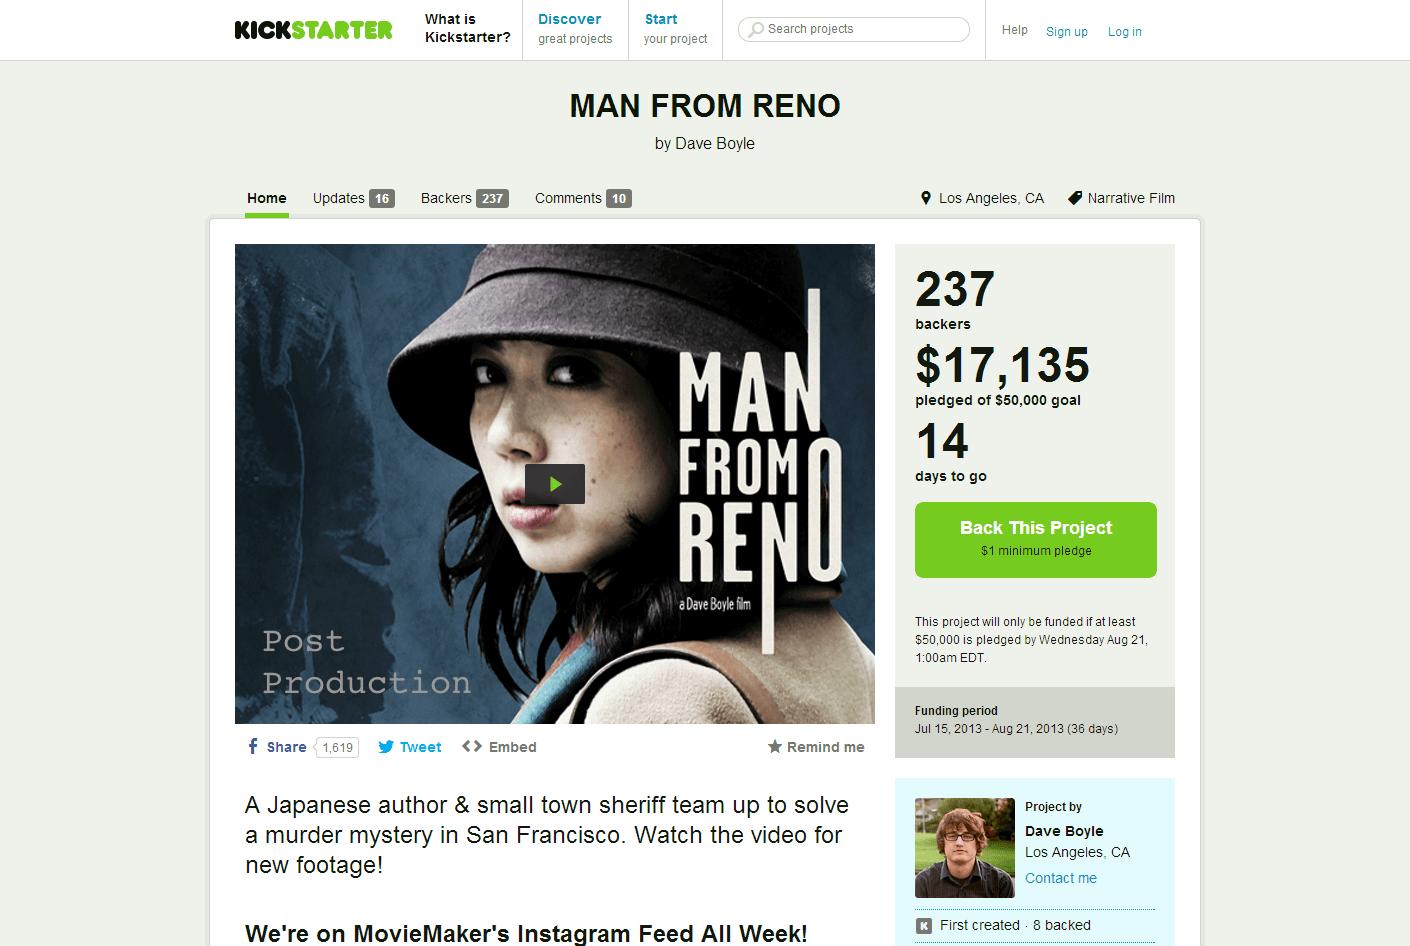 MAN-FROM-RENO-by-Dave-Boyle-Kickstarter 藤谷文子、北村一輝主演の映画「Man From Reno リノから来た男」がKickstarterで制作資金を募集中!! Post